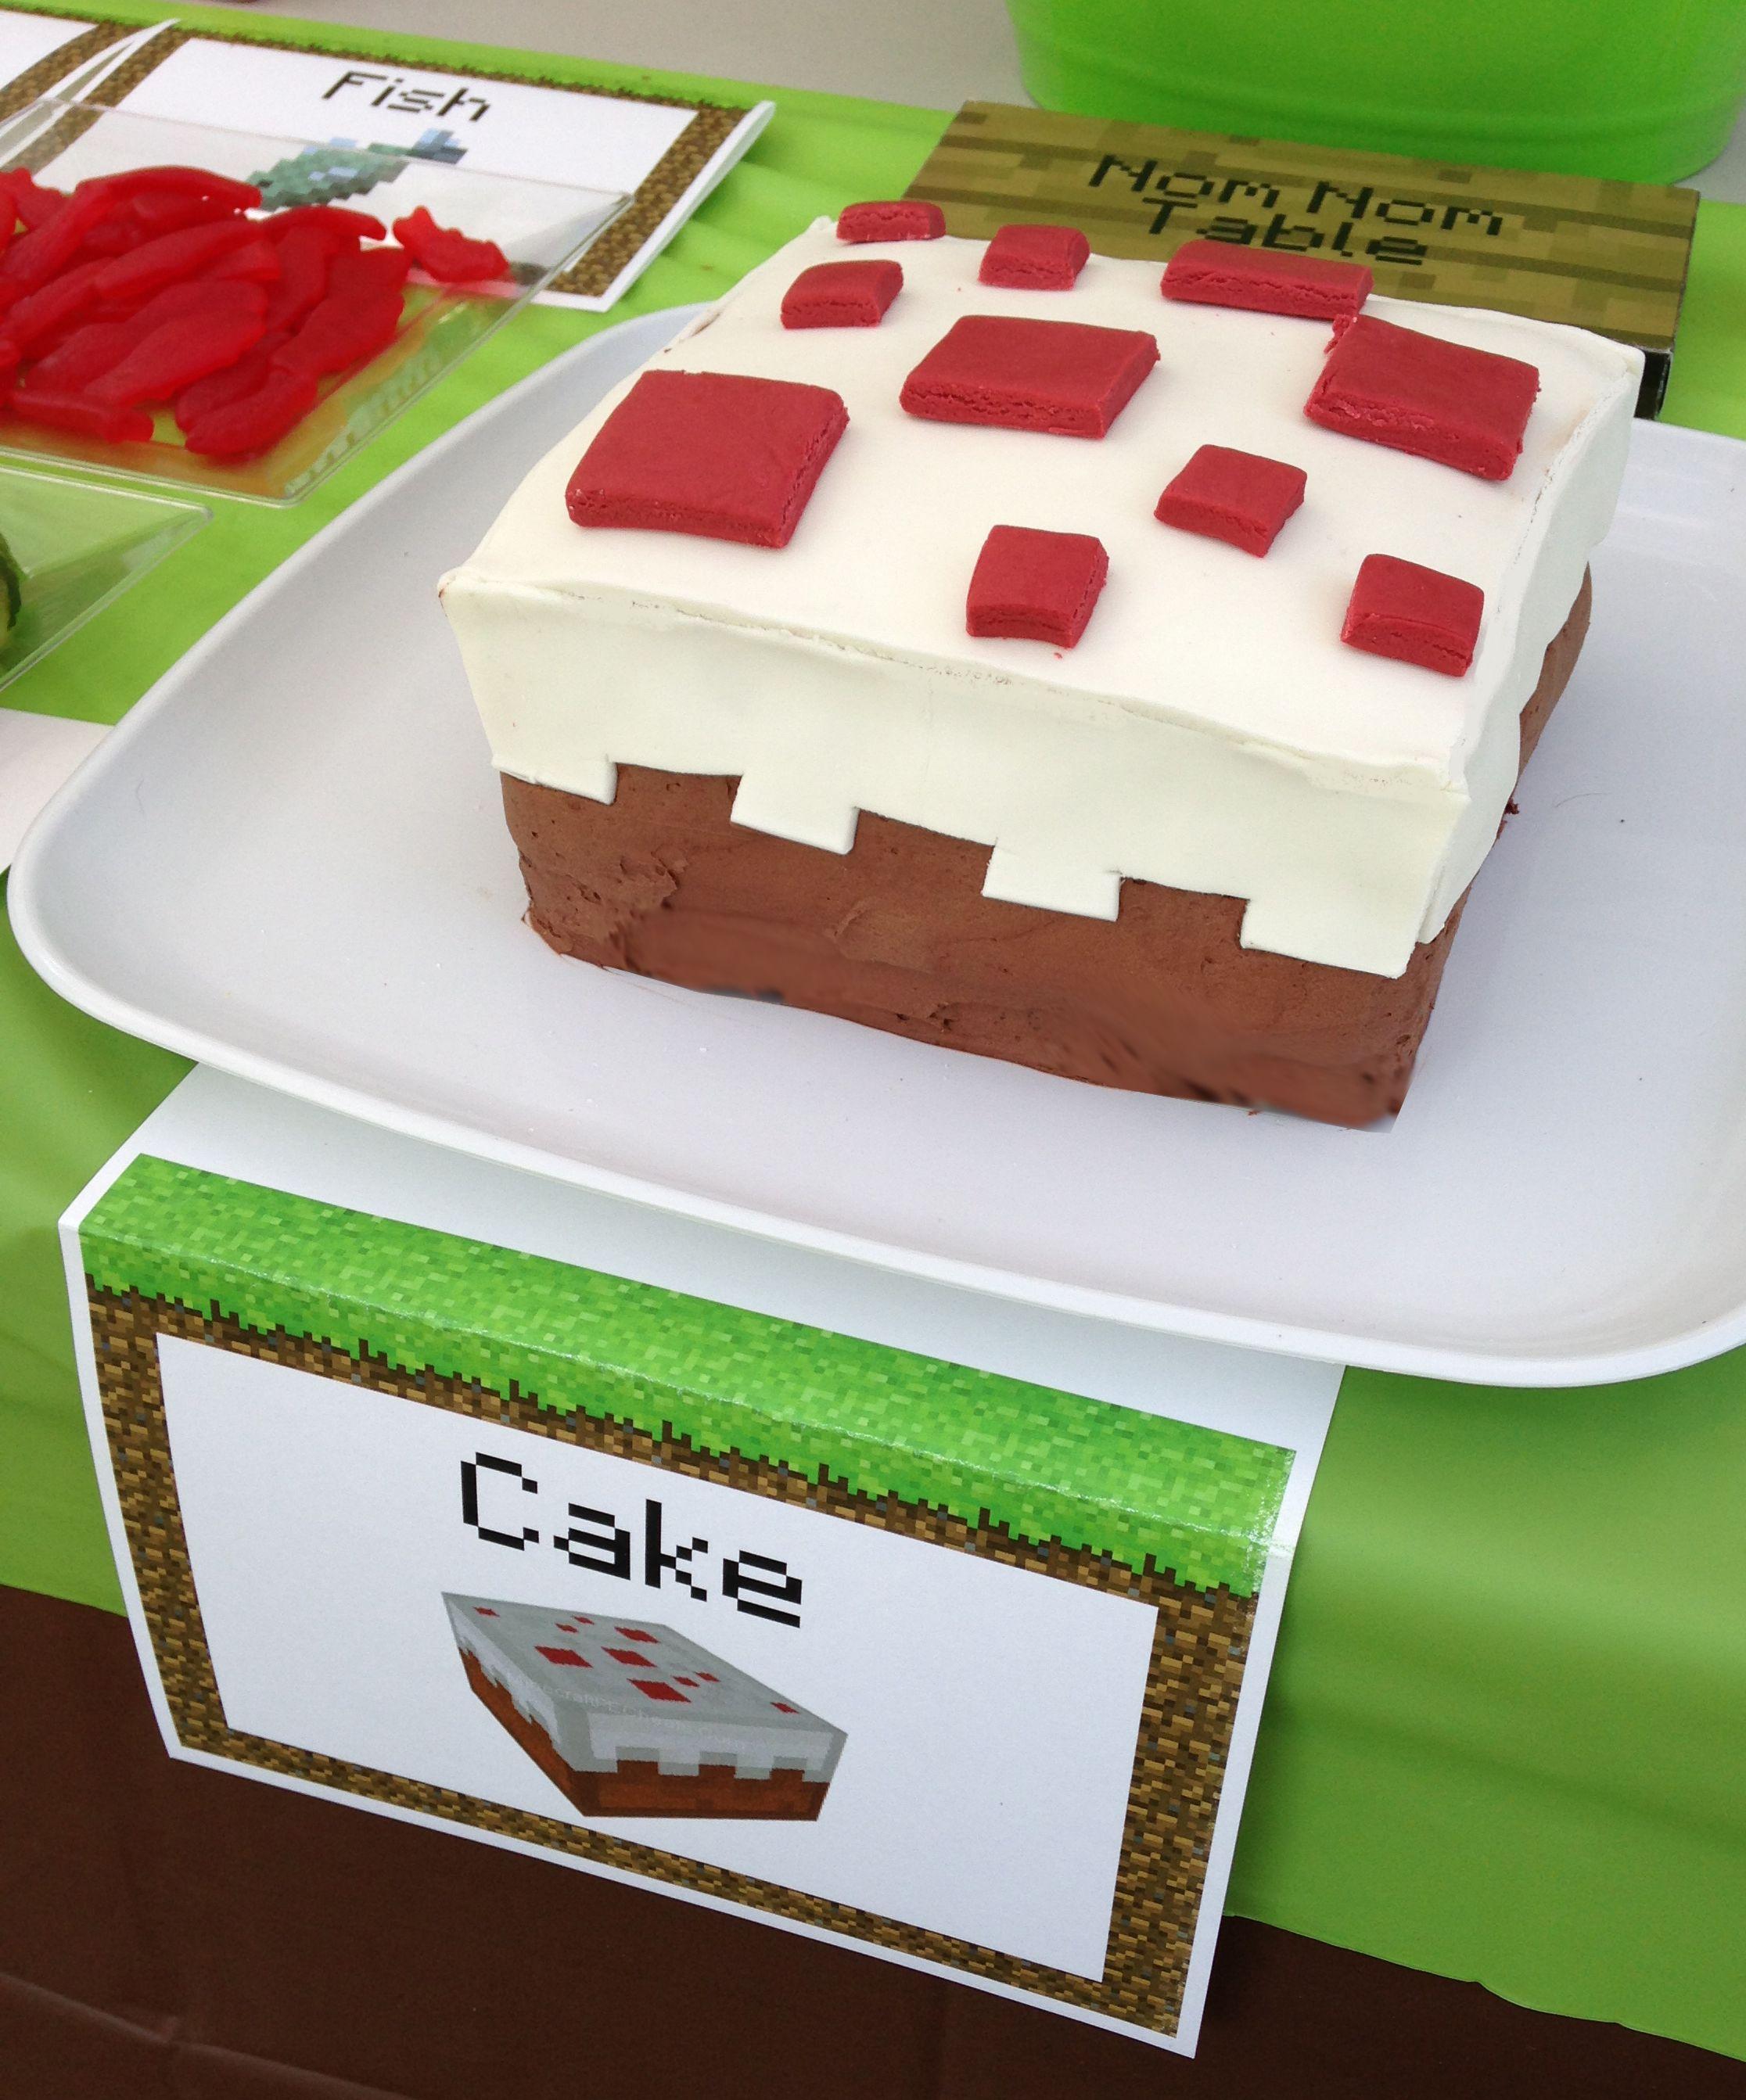 Küche Bs Wsw | How To Make This Cake Block Minecraft Birthday Cake Minecraft